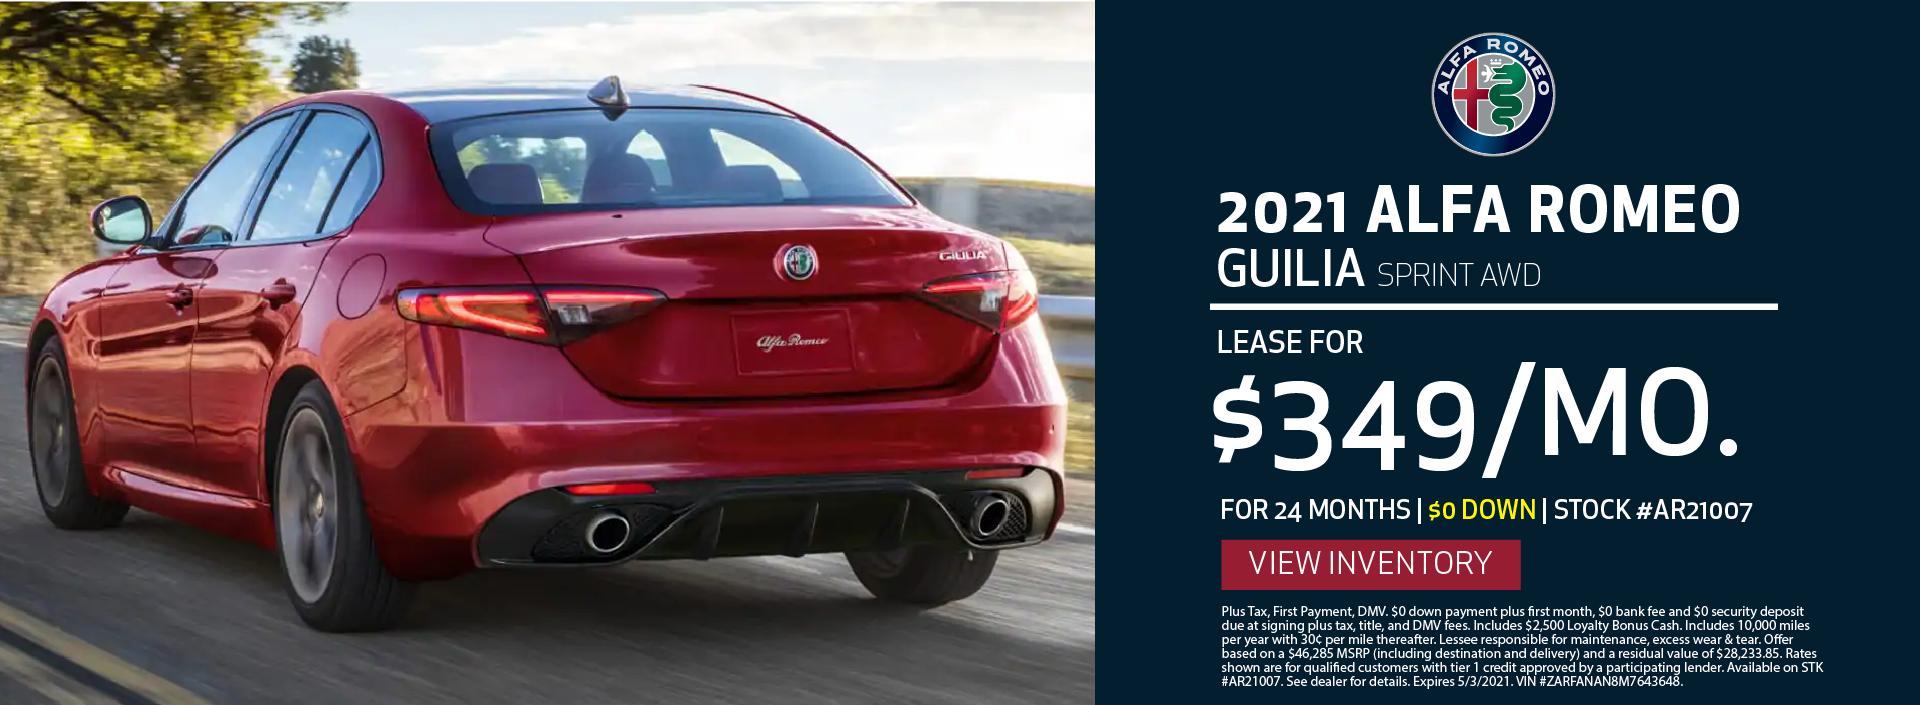 Manhattan Alfa Romeo – 2021 Guilia Sprint